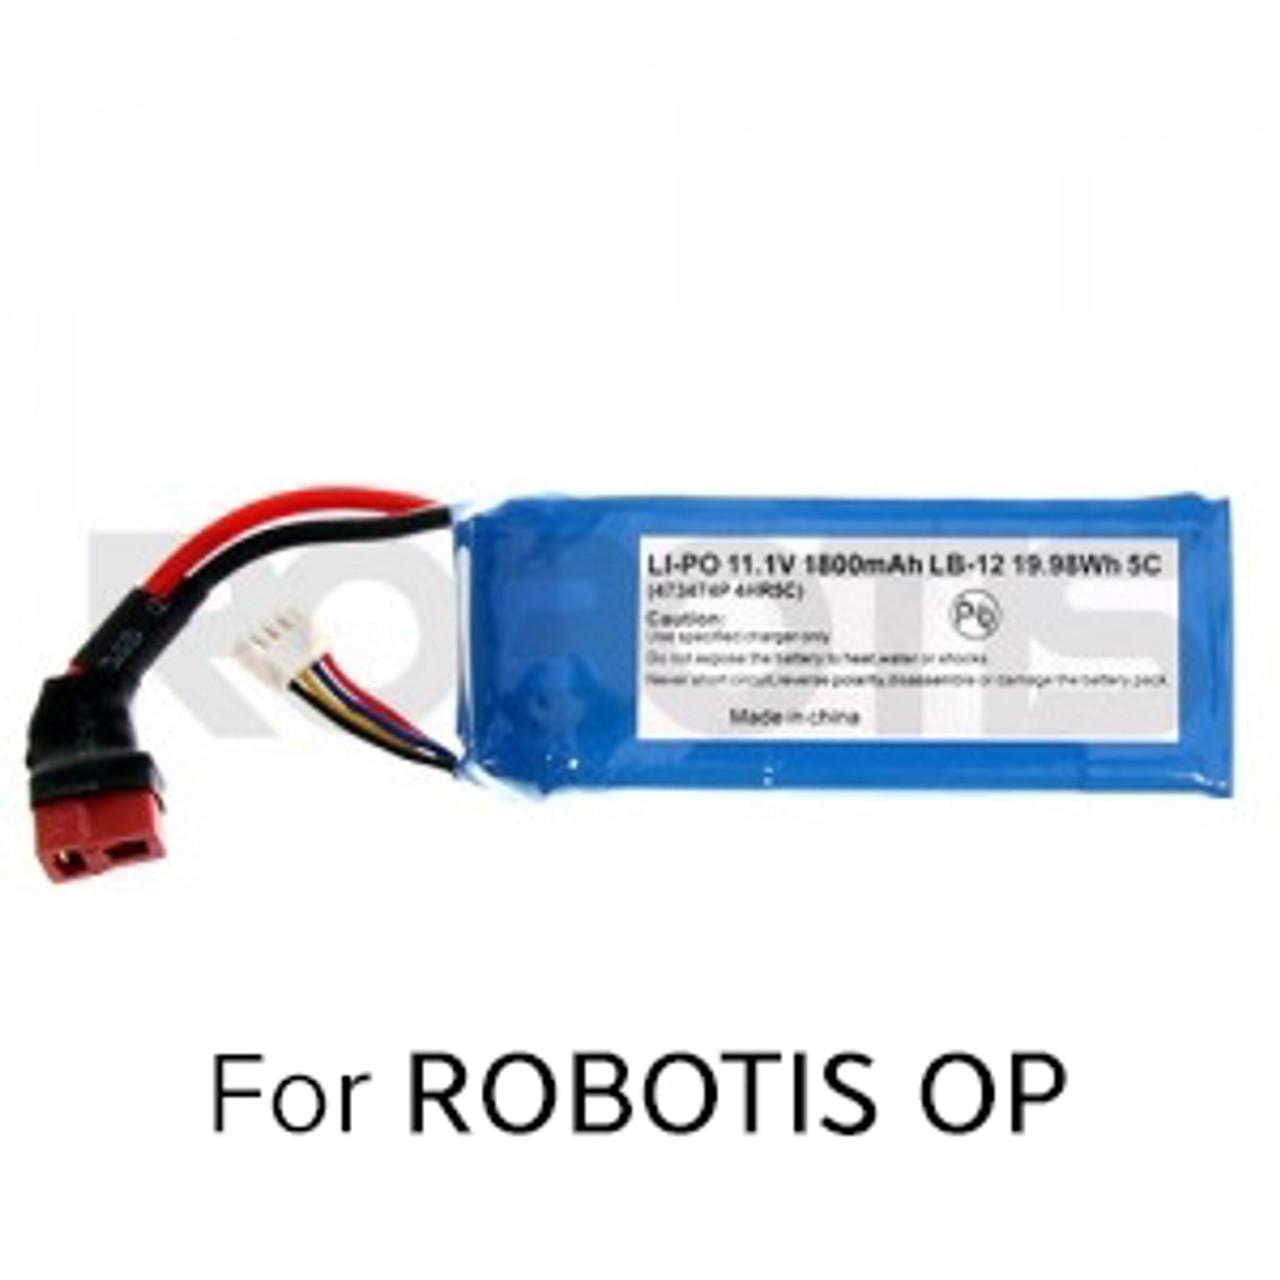 LIPO Battery 11.1V 1800mAh LB-012